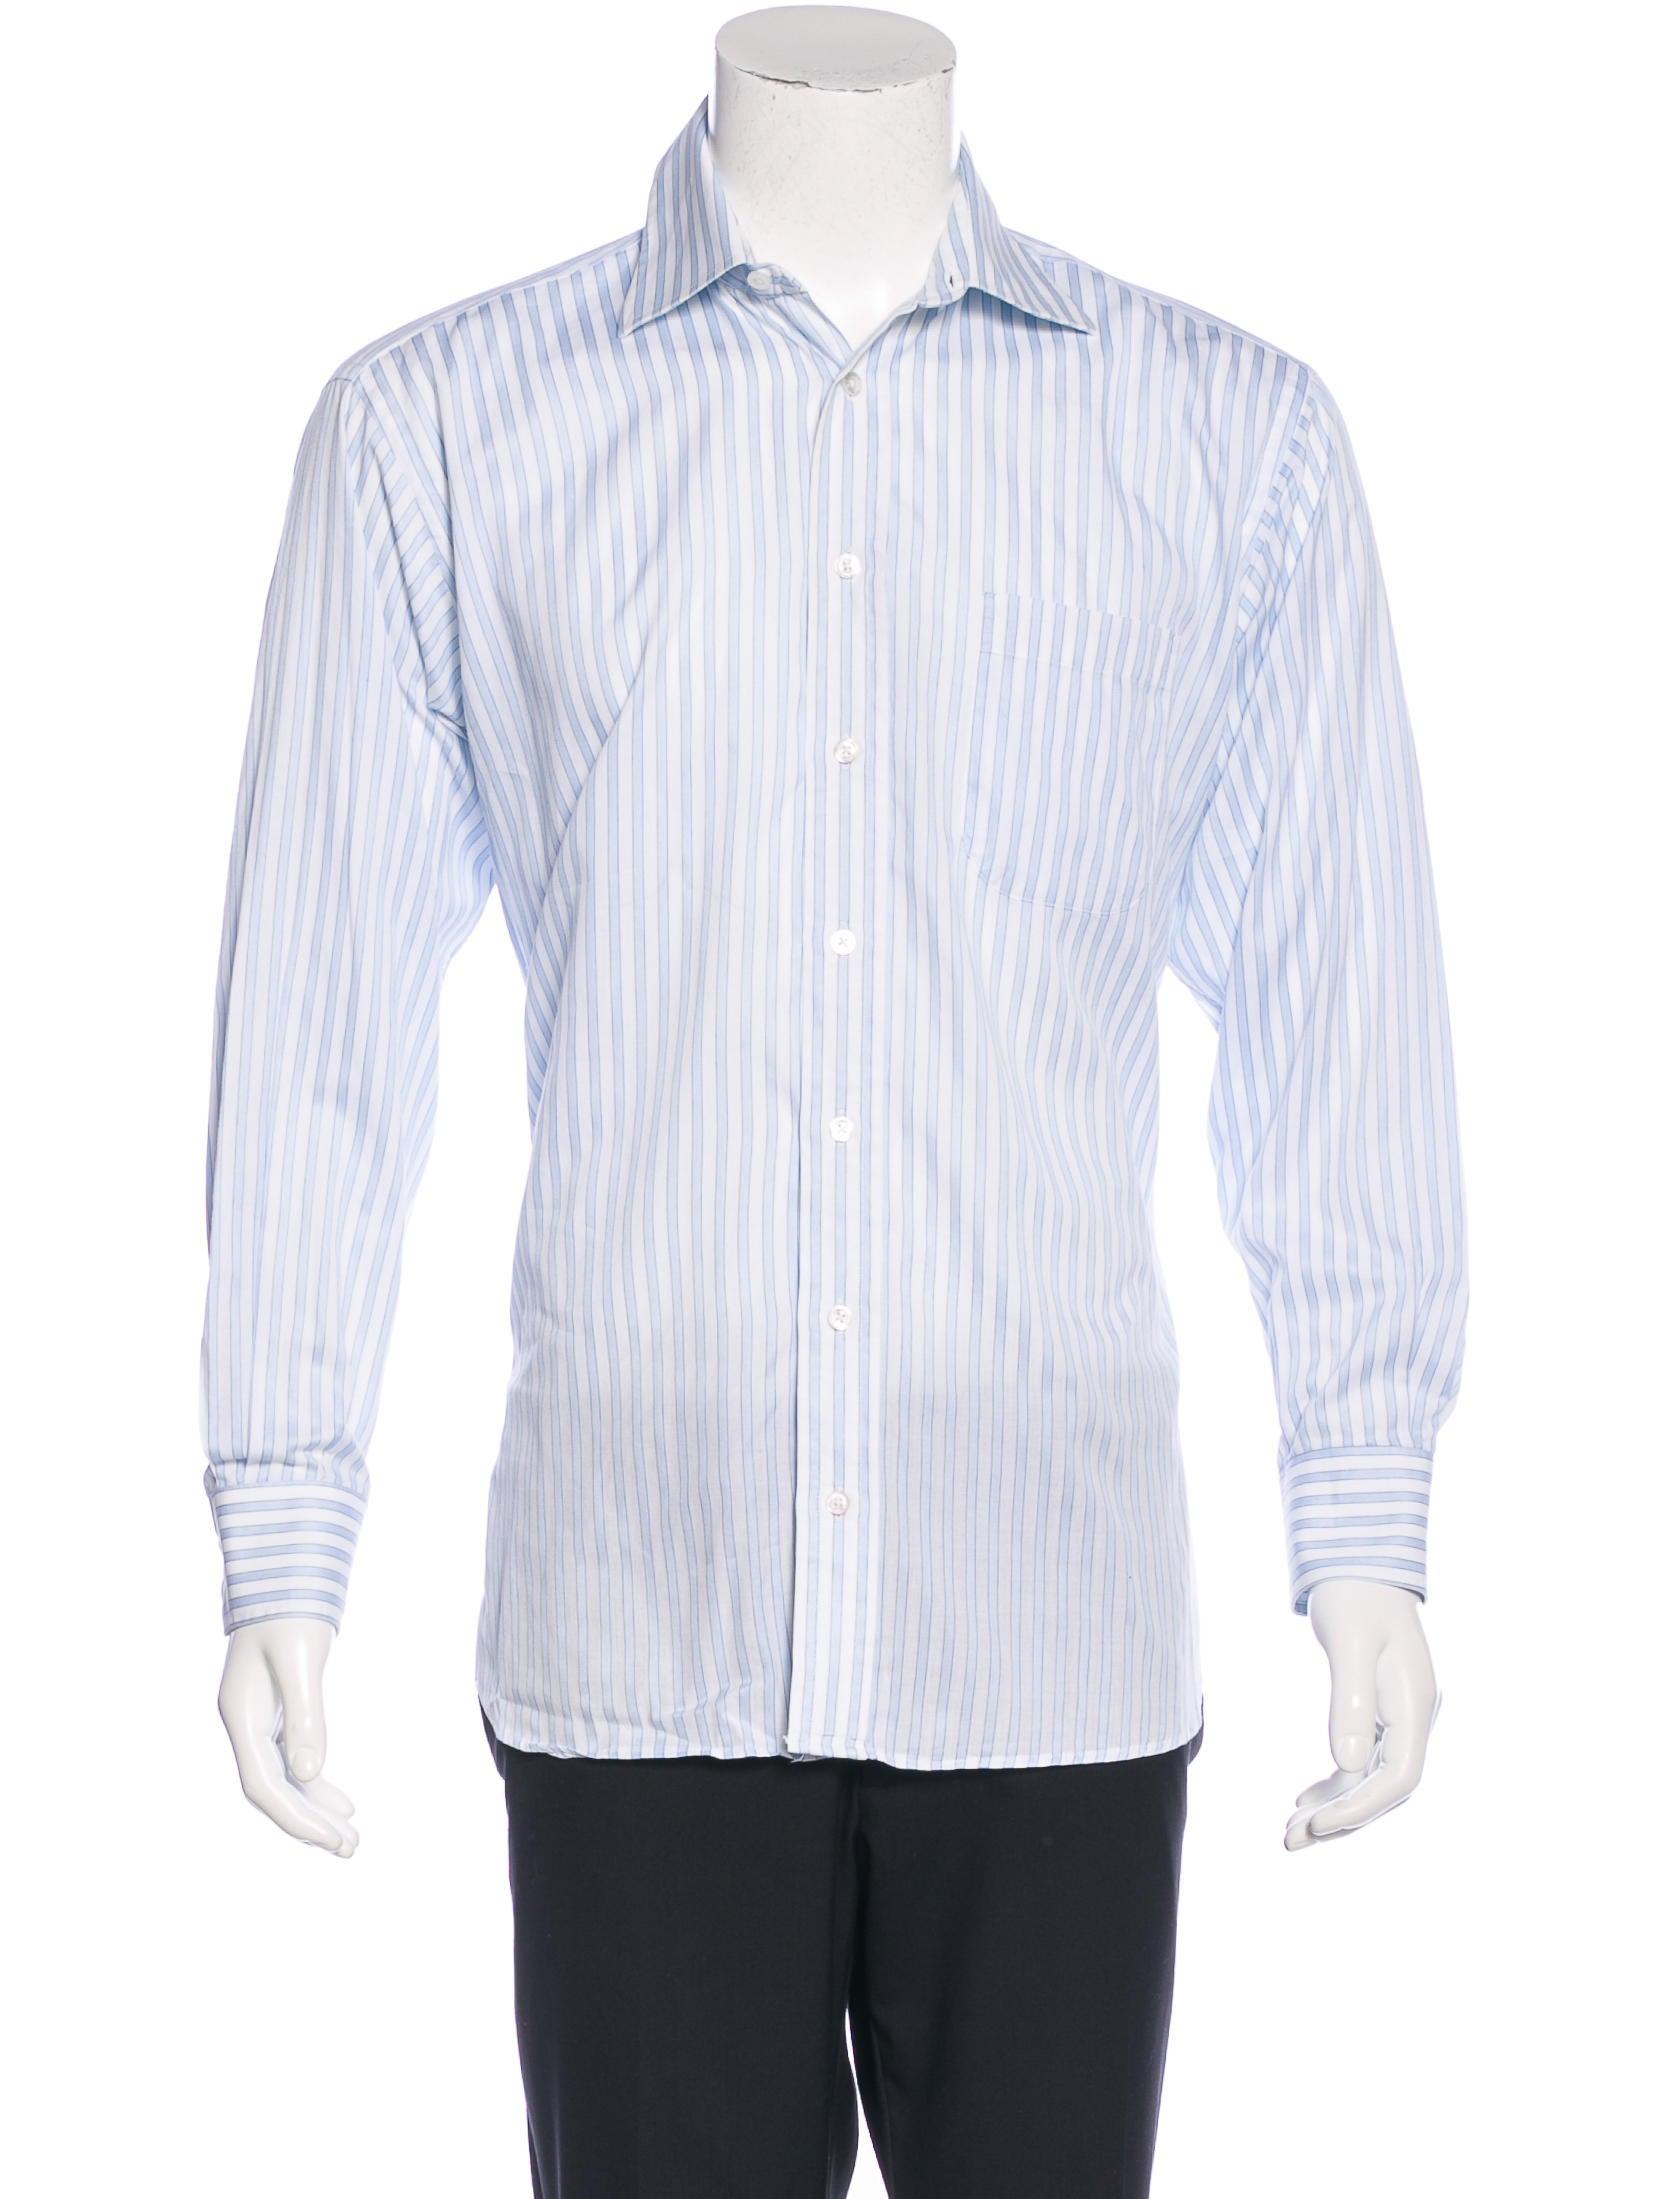 Burberry London Candy Stripe Dress Shirt Clothing